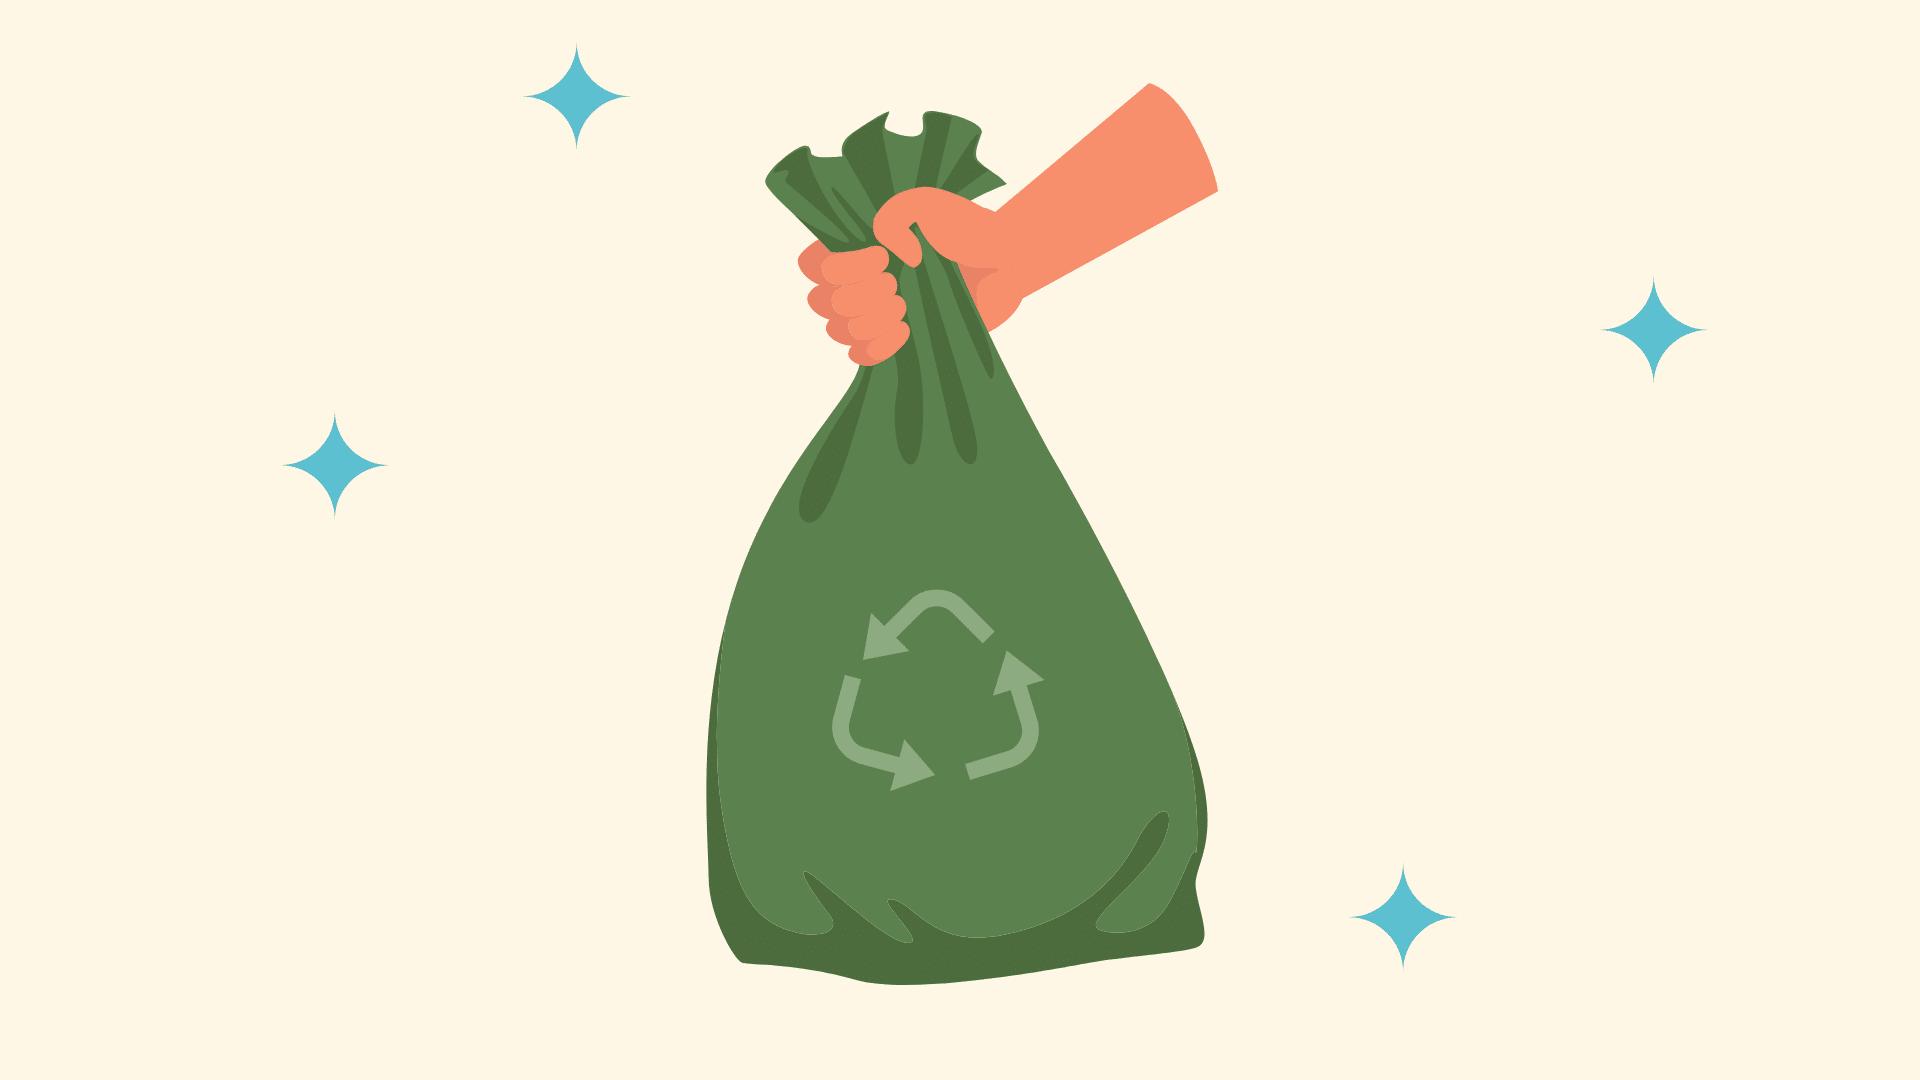 Biodegradeable vs compostable trash bag featured image